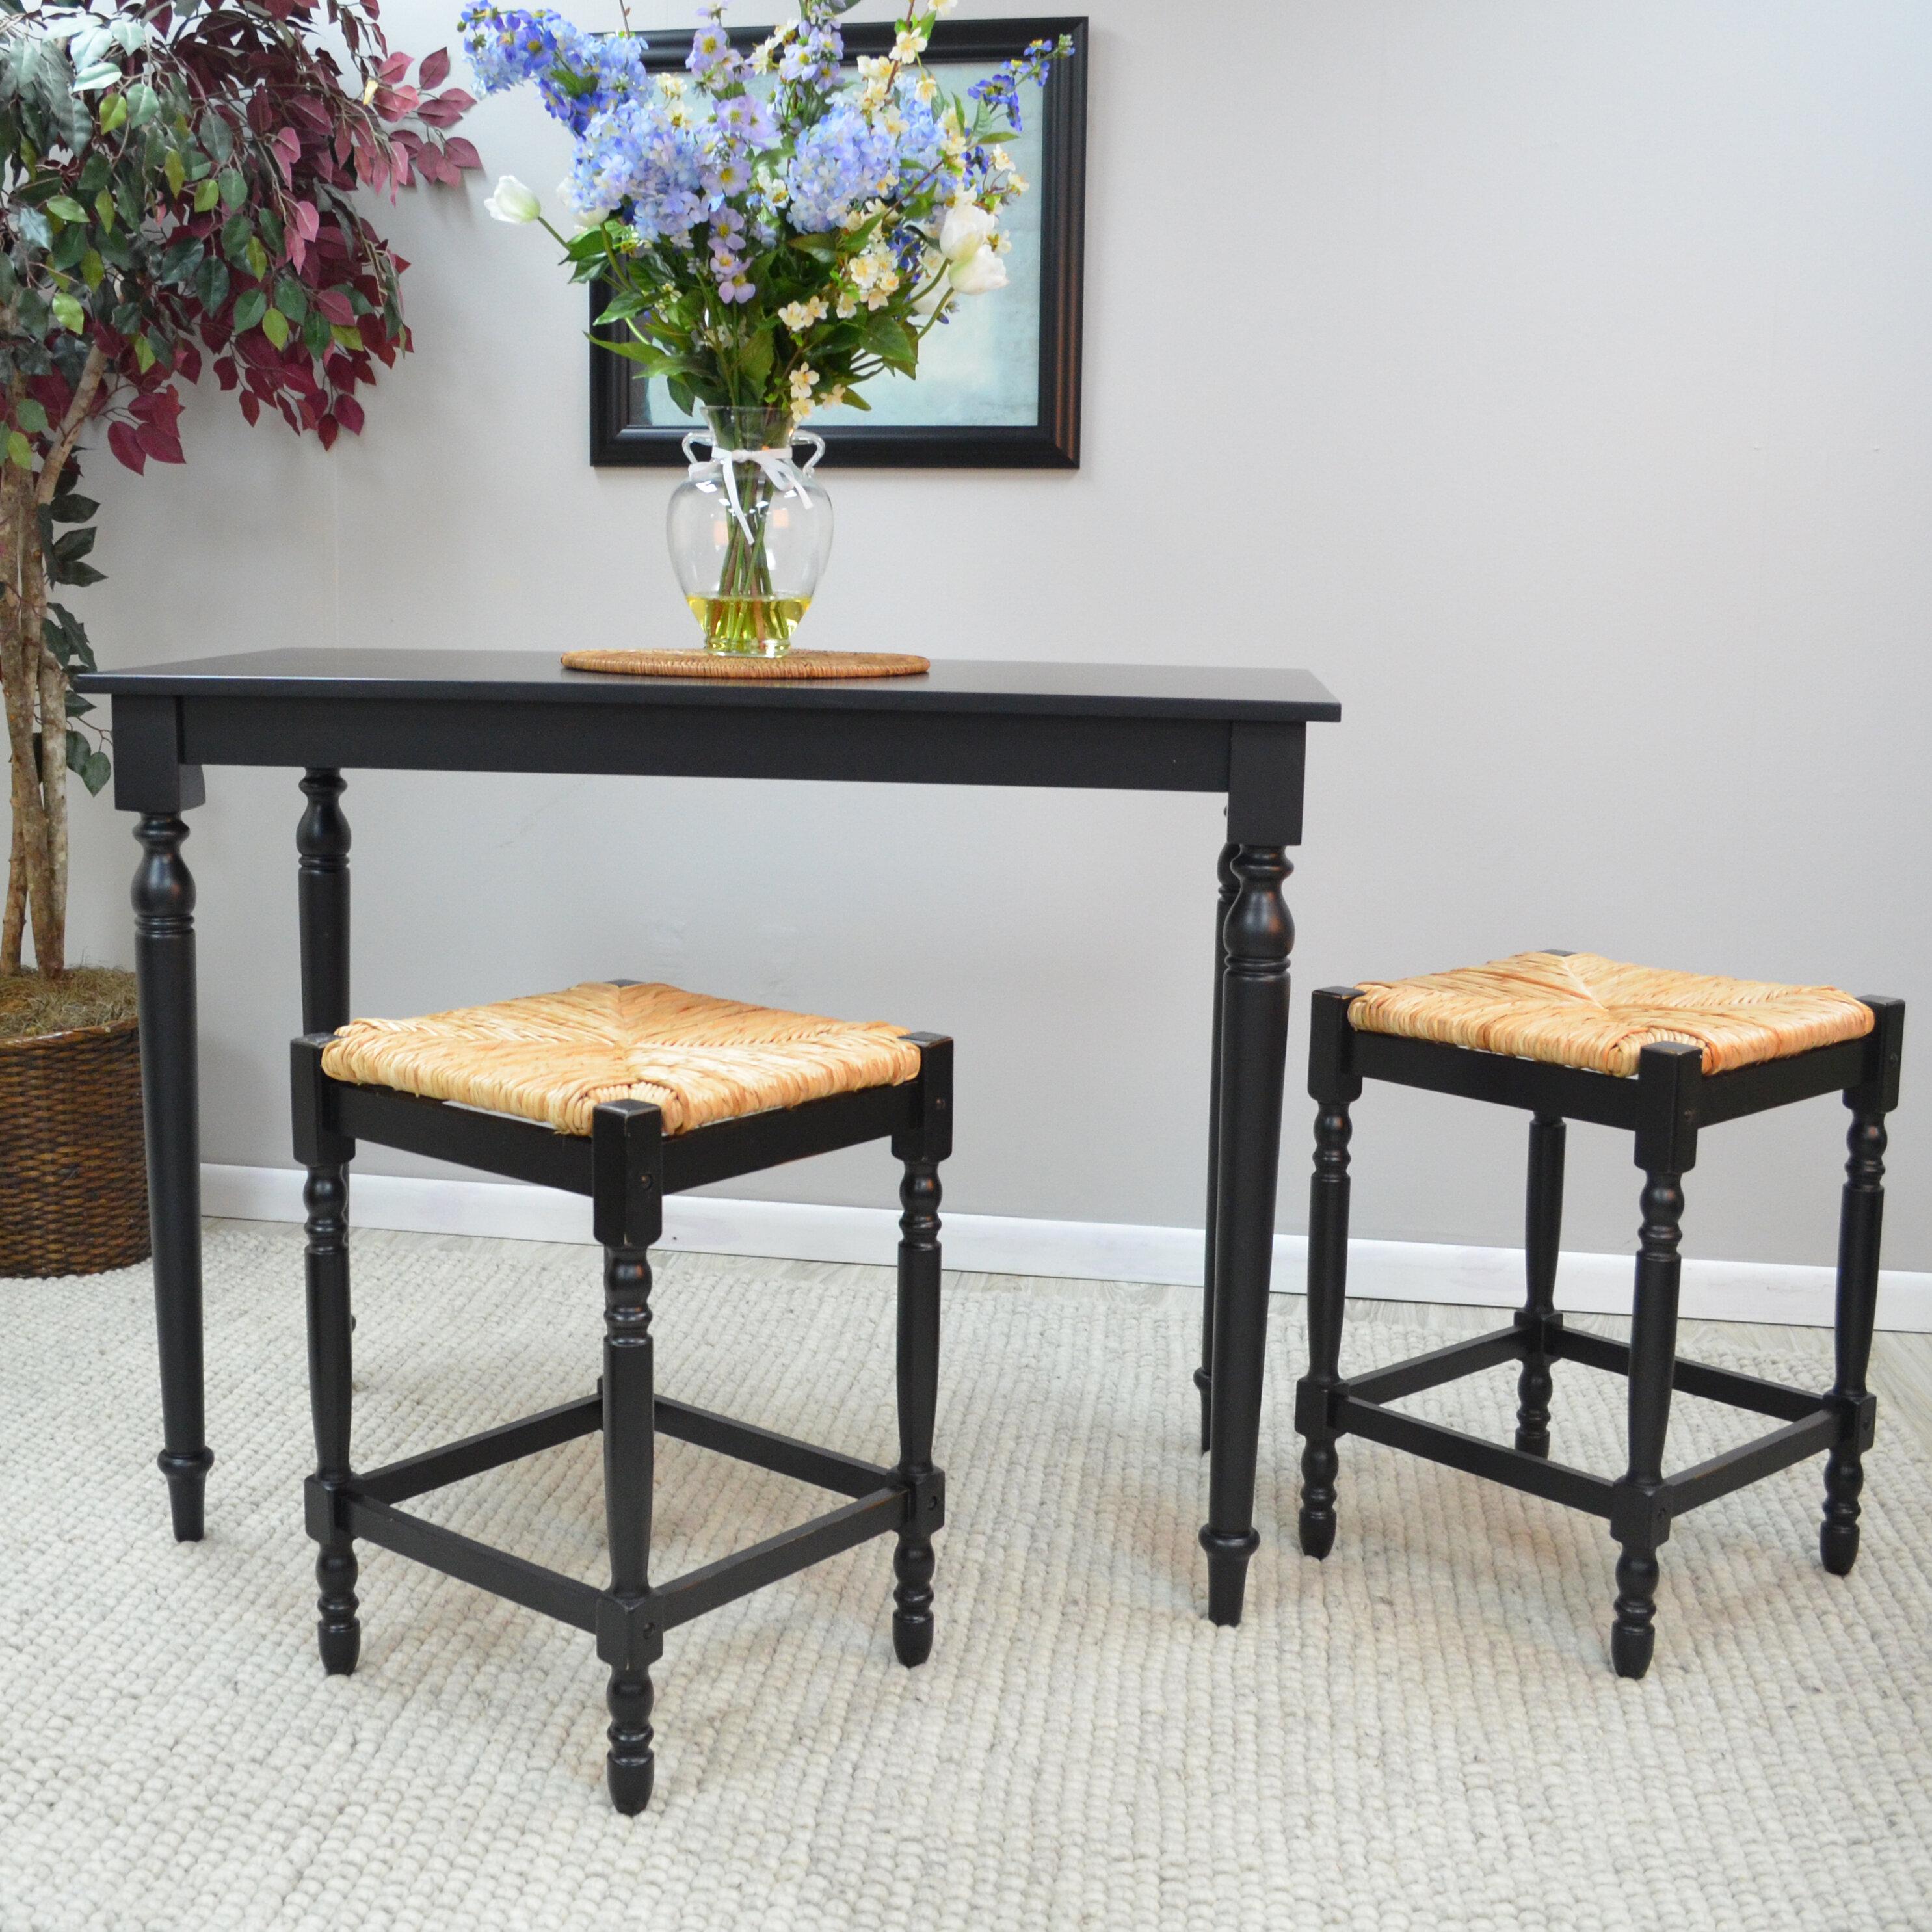 August Grove Emilia 3 Piece Counter Height Pub Table Sets \u0026 Reviews | Wayfair & August Grove Emilia 3 Piece Counter Height Pub Table Sets \u0026 Reviews ...